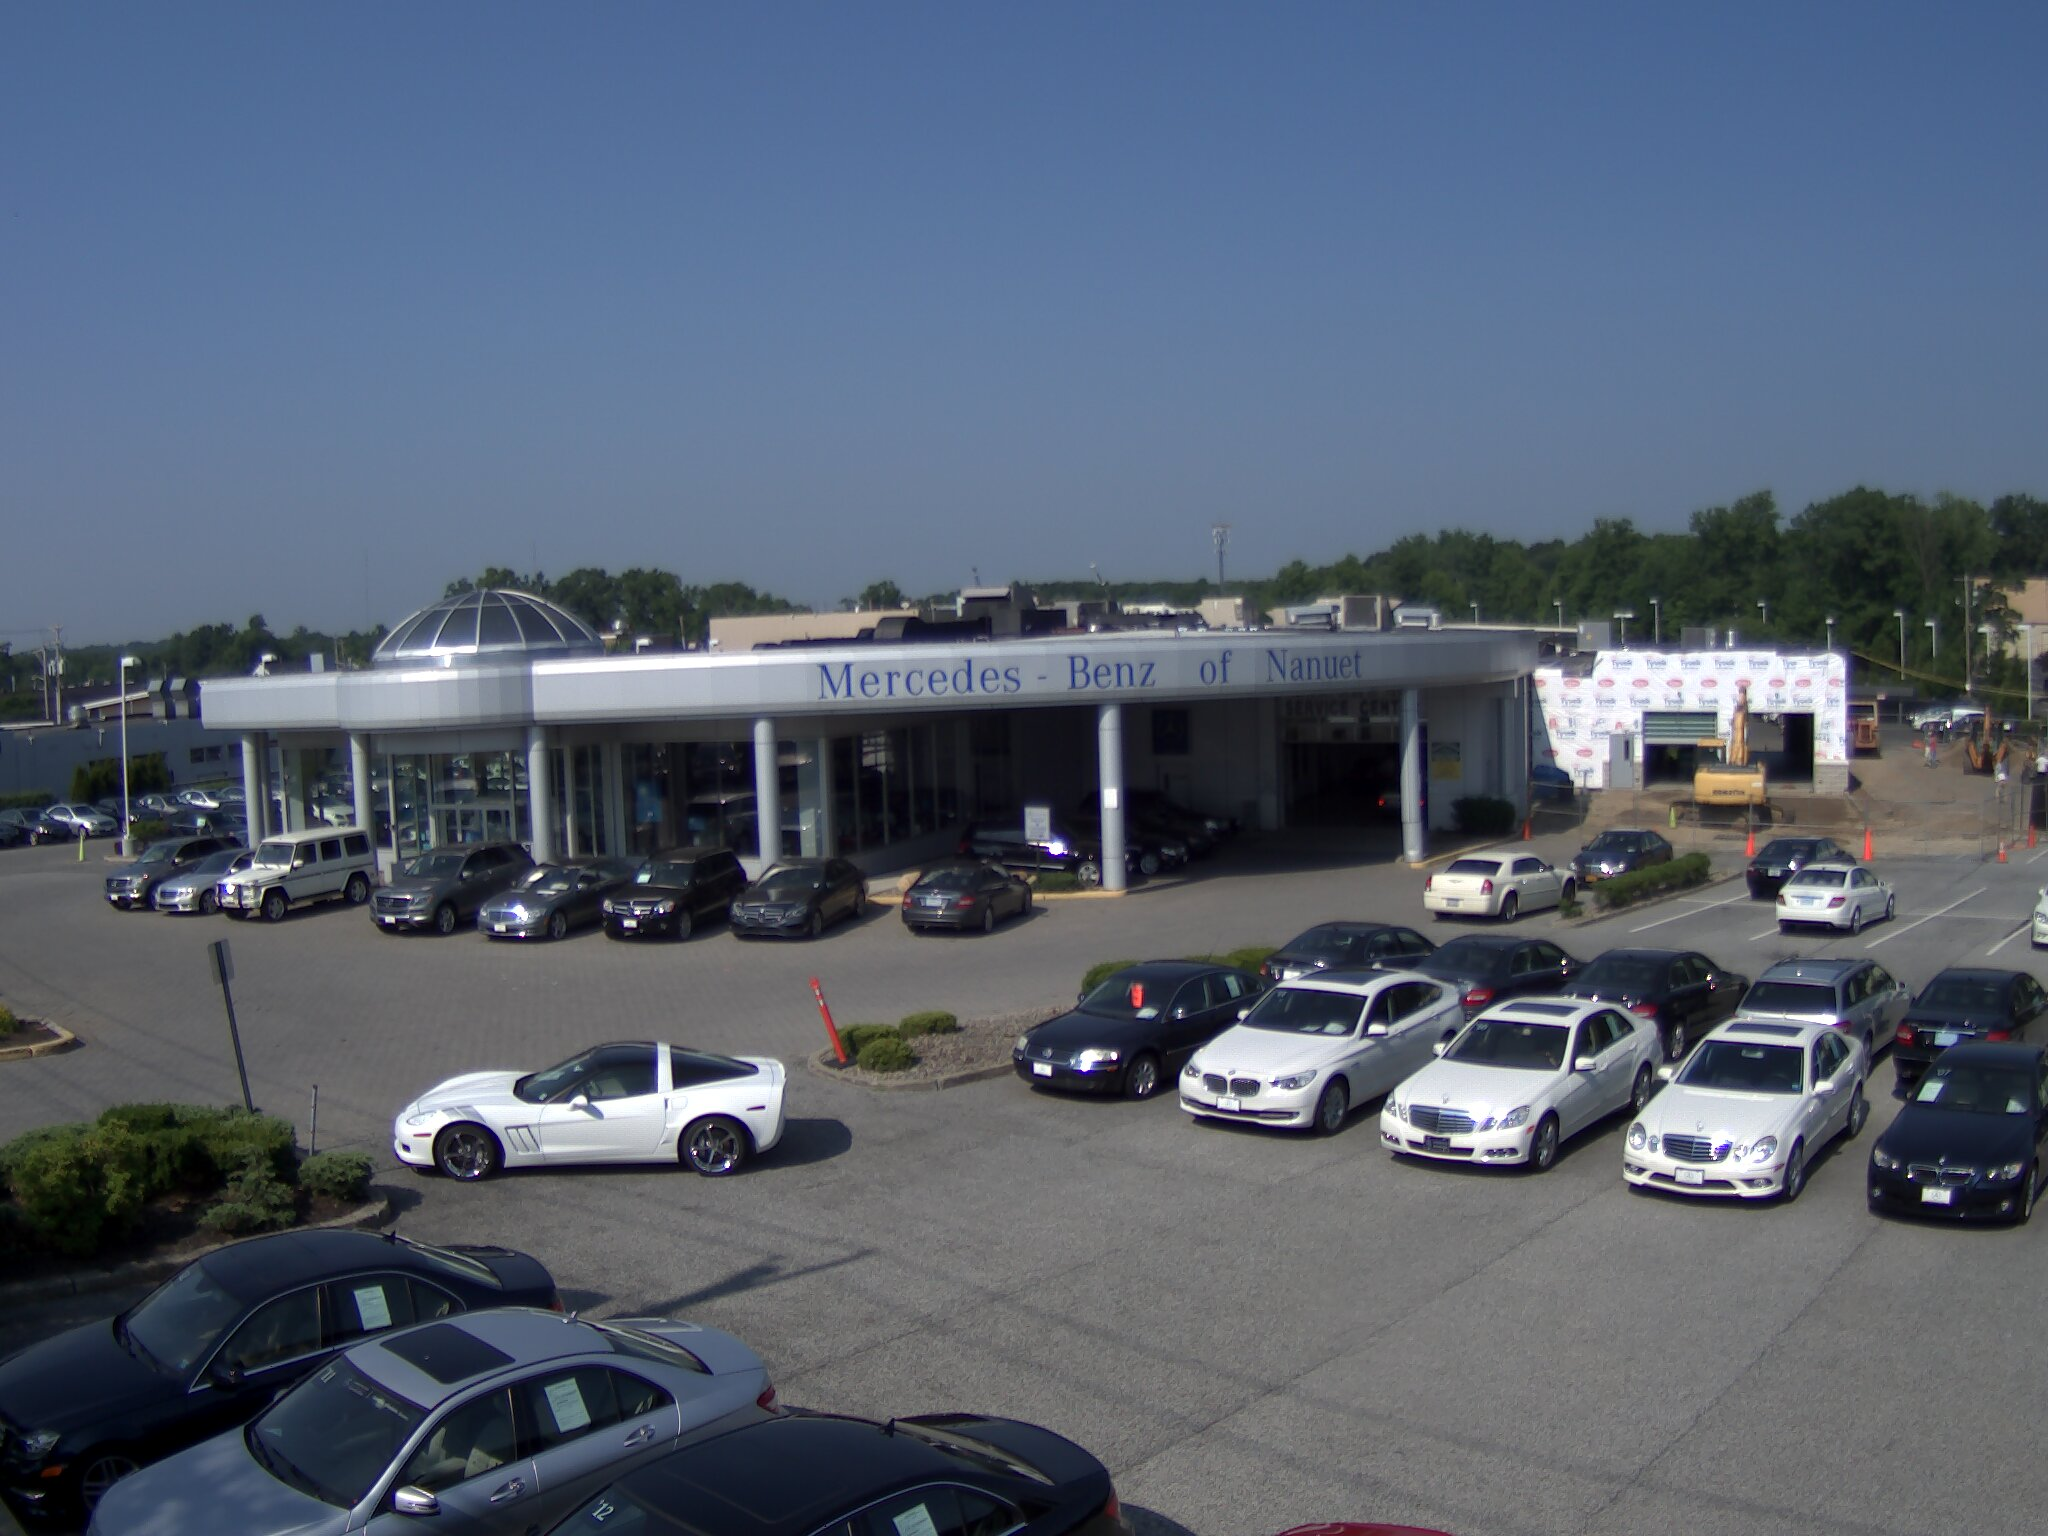 Truelook chosen to provide construction webcam during for Mercedes benz of nanuet nanuet ny